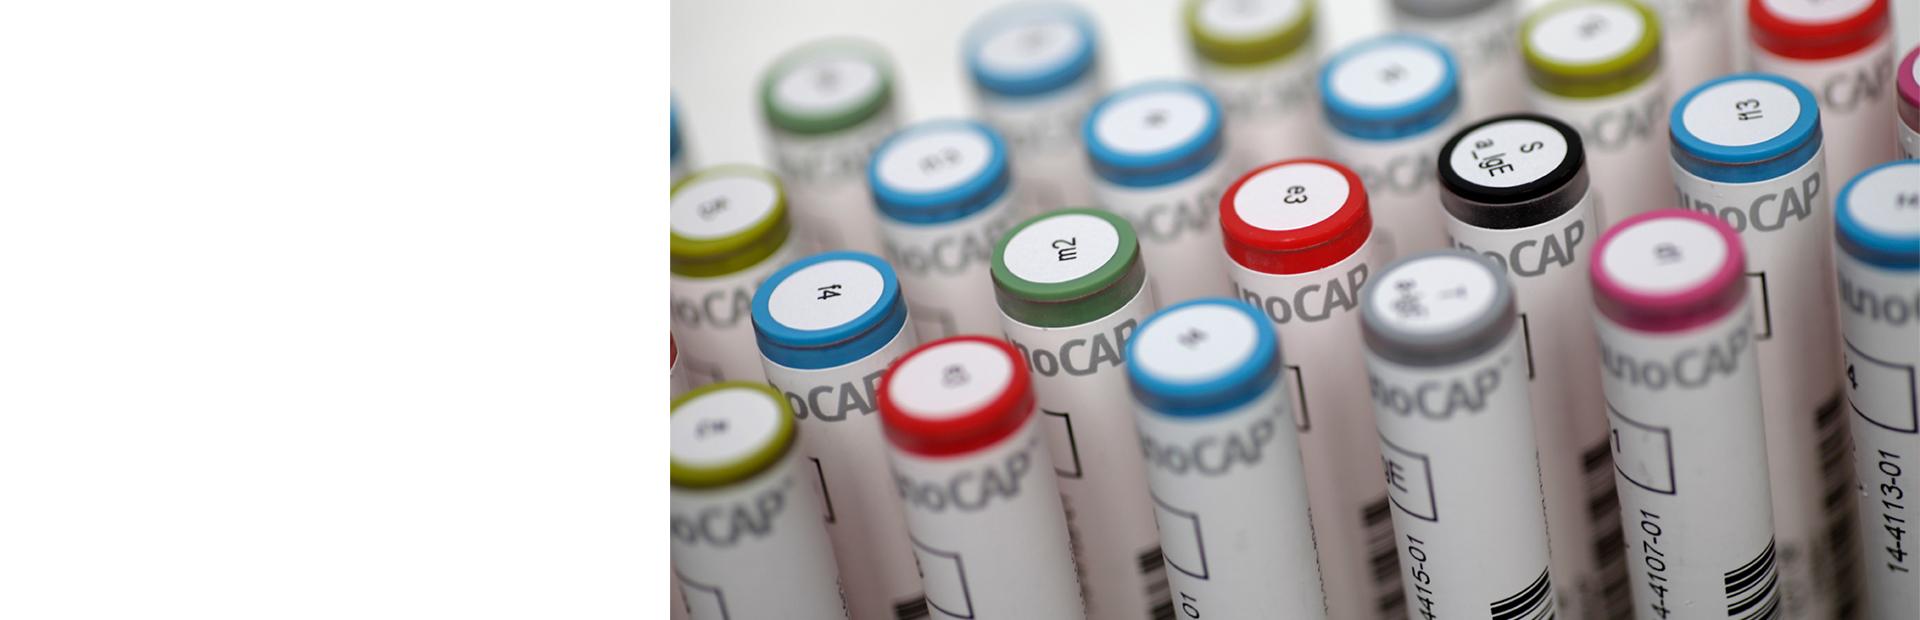 IgE - аллерготесты, смеси, панели, общий IgE